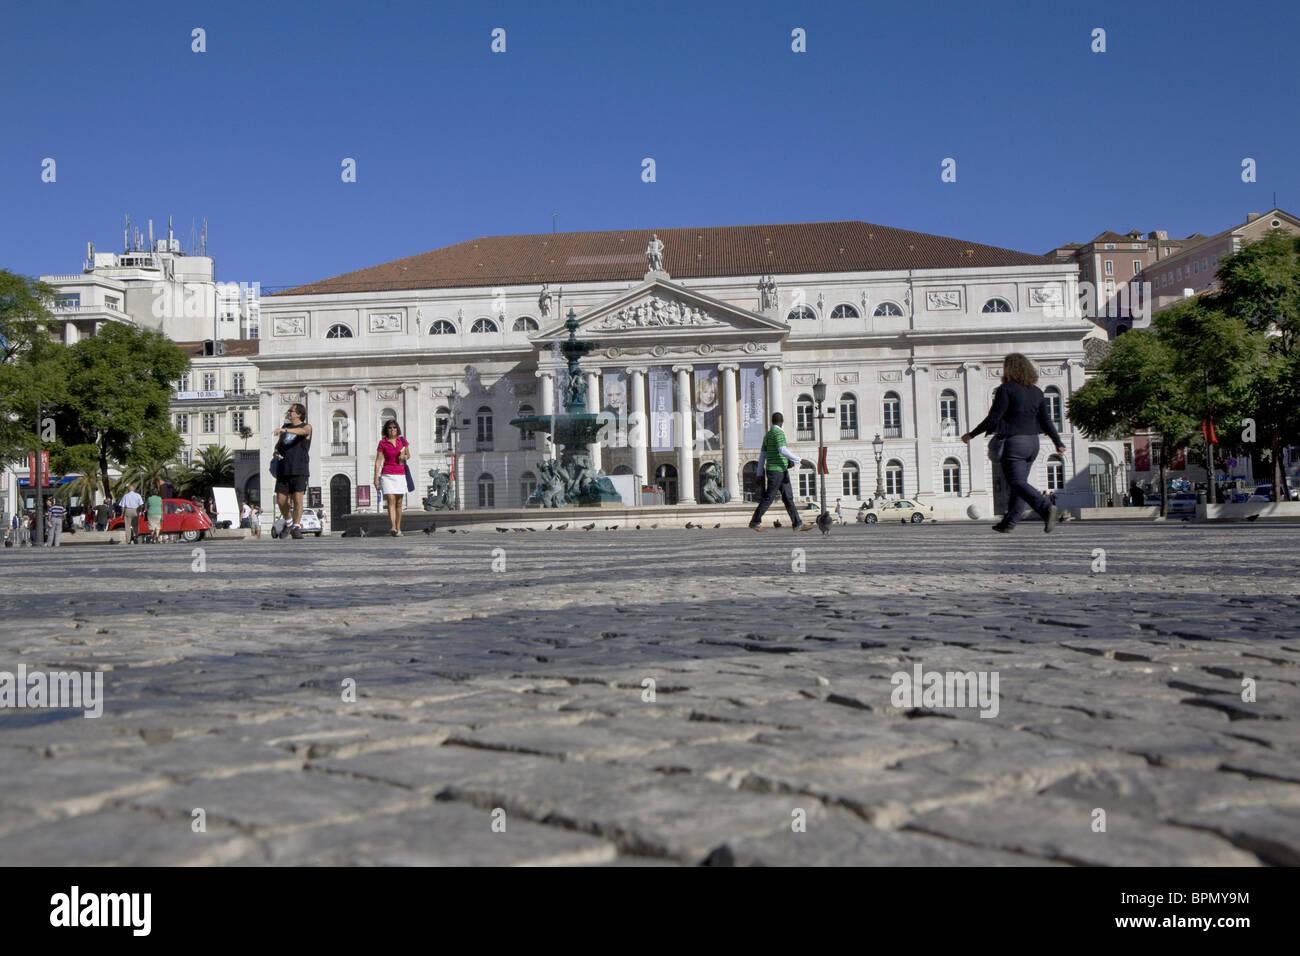 National Theater Dona Maria II, Rossio square, Baixa, Lisbon, Portugal Stock Photo